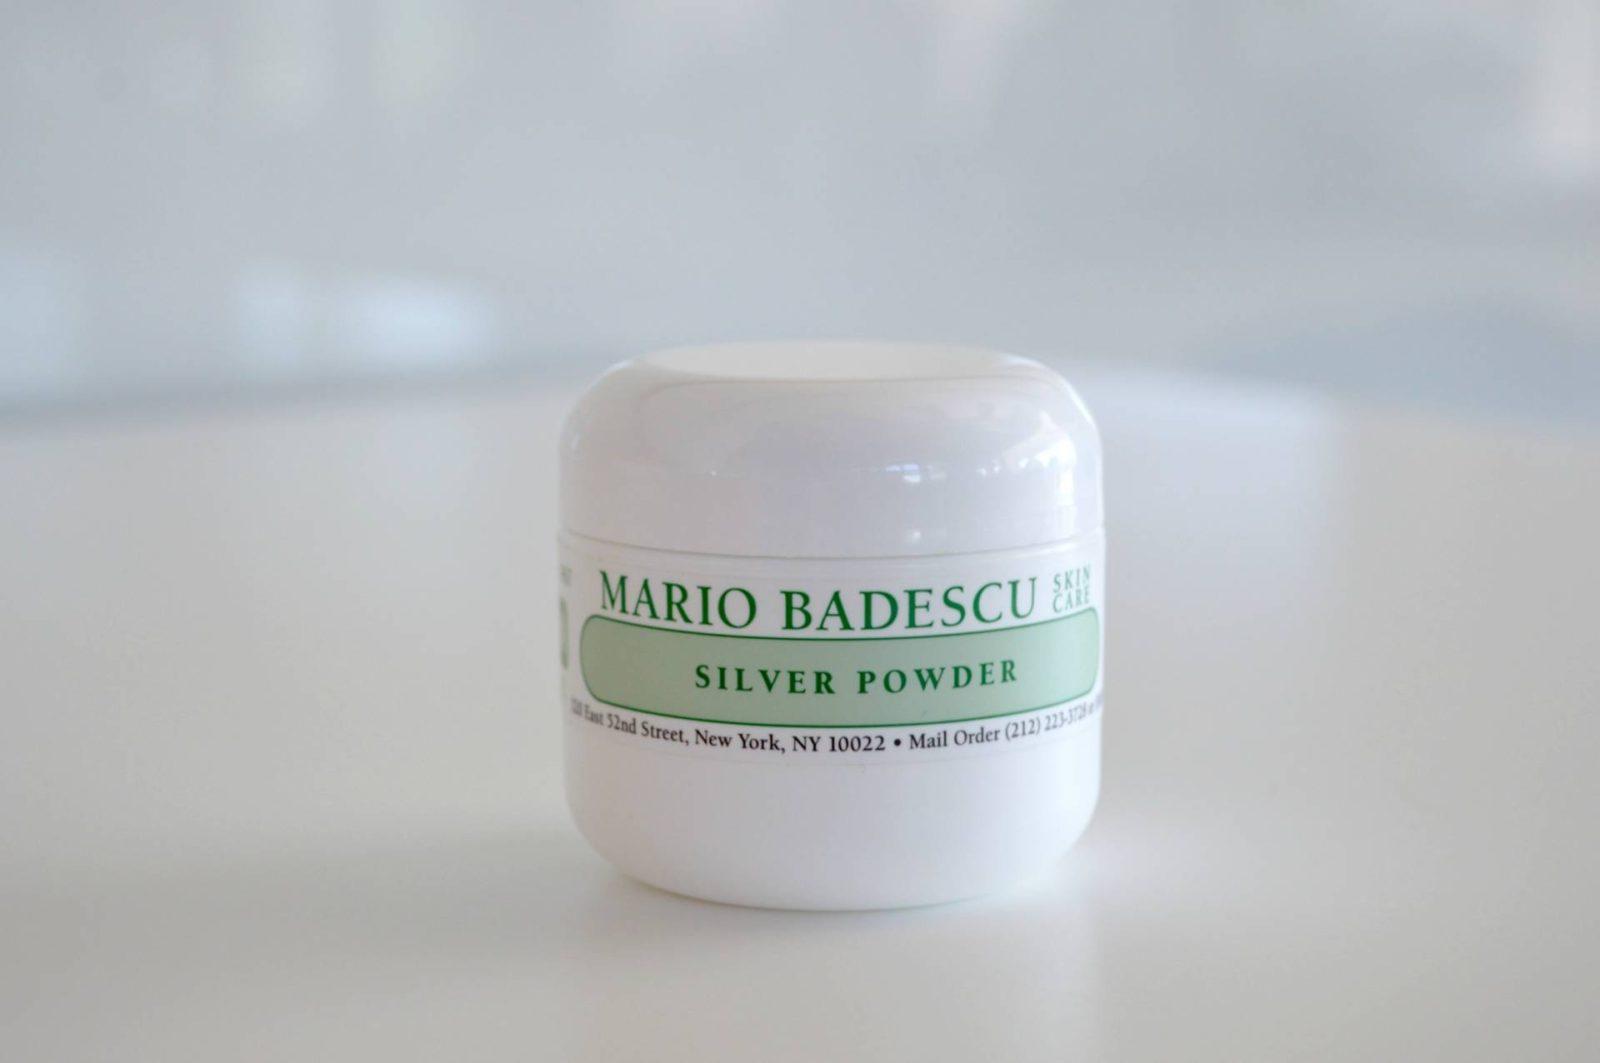 Clogged Pores? Blackheads? Try The Mario Badescu Silver Powder!